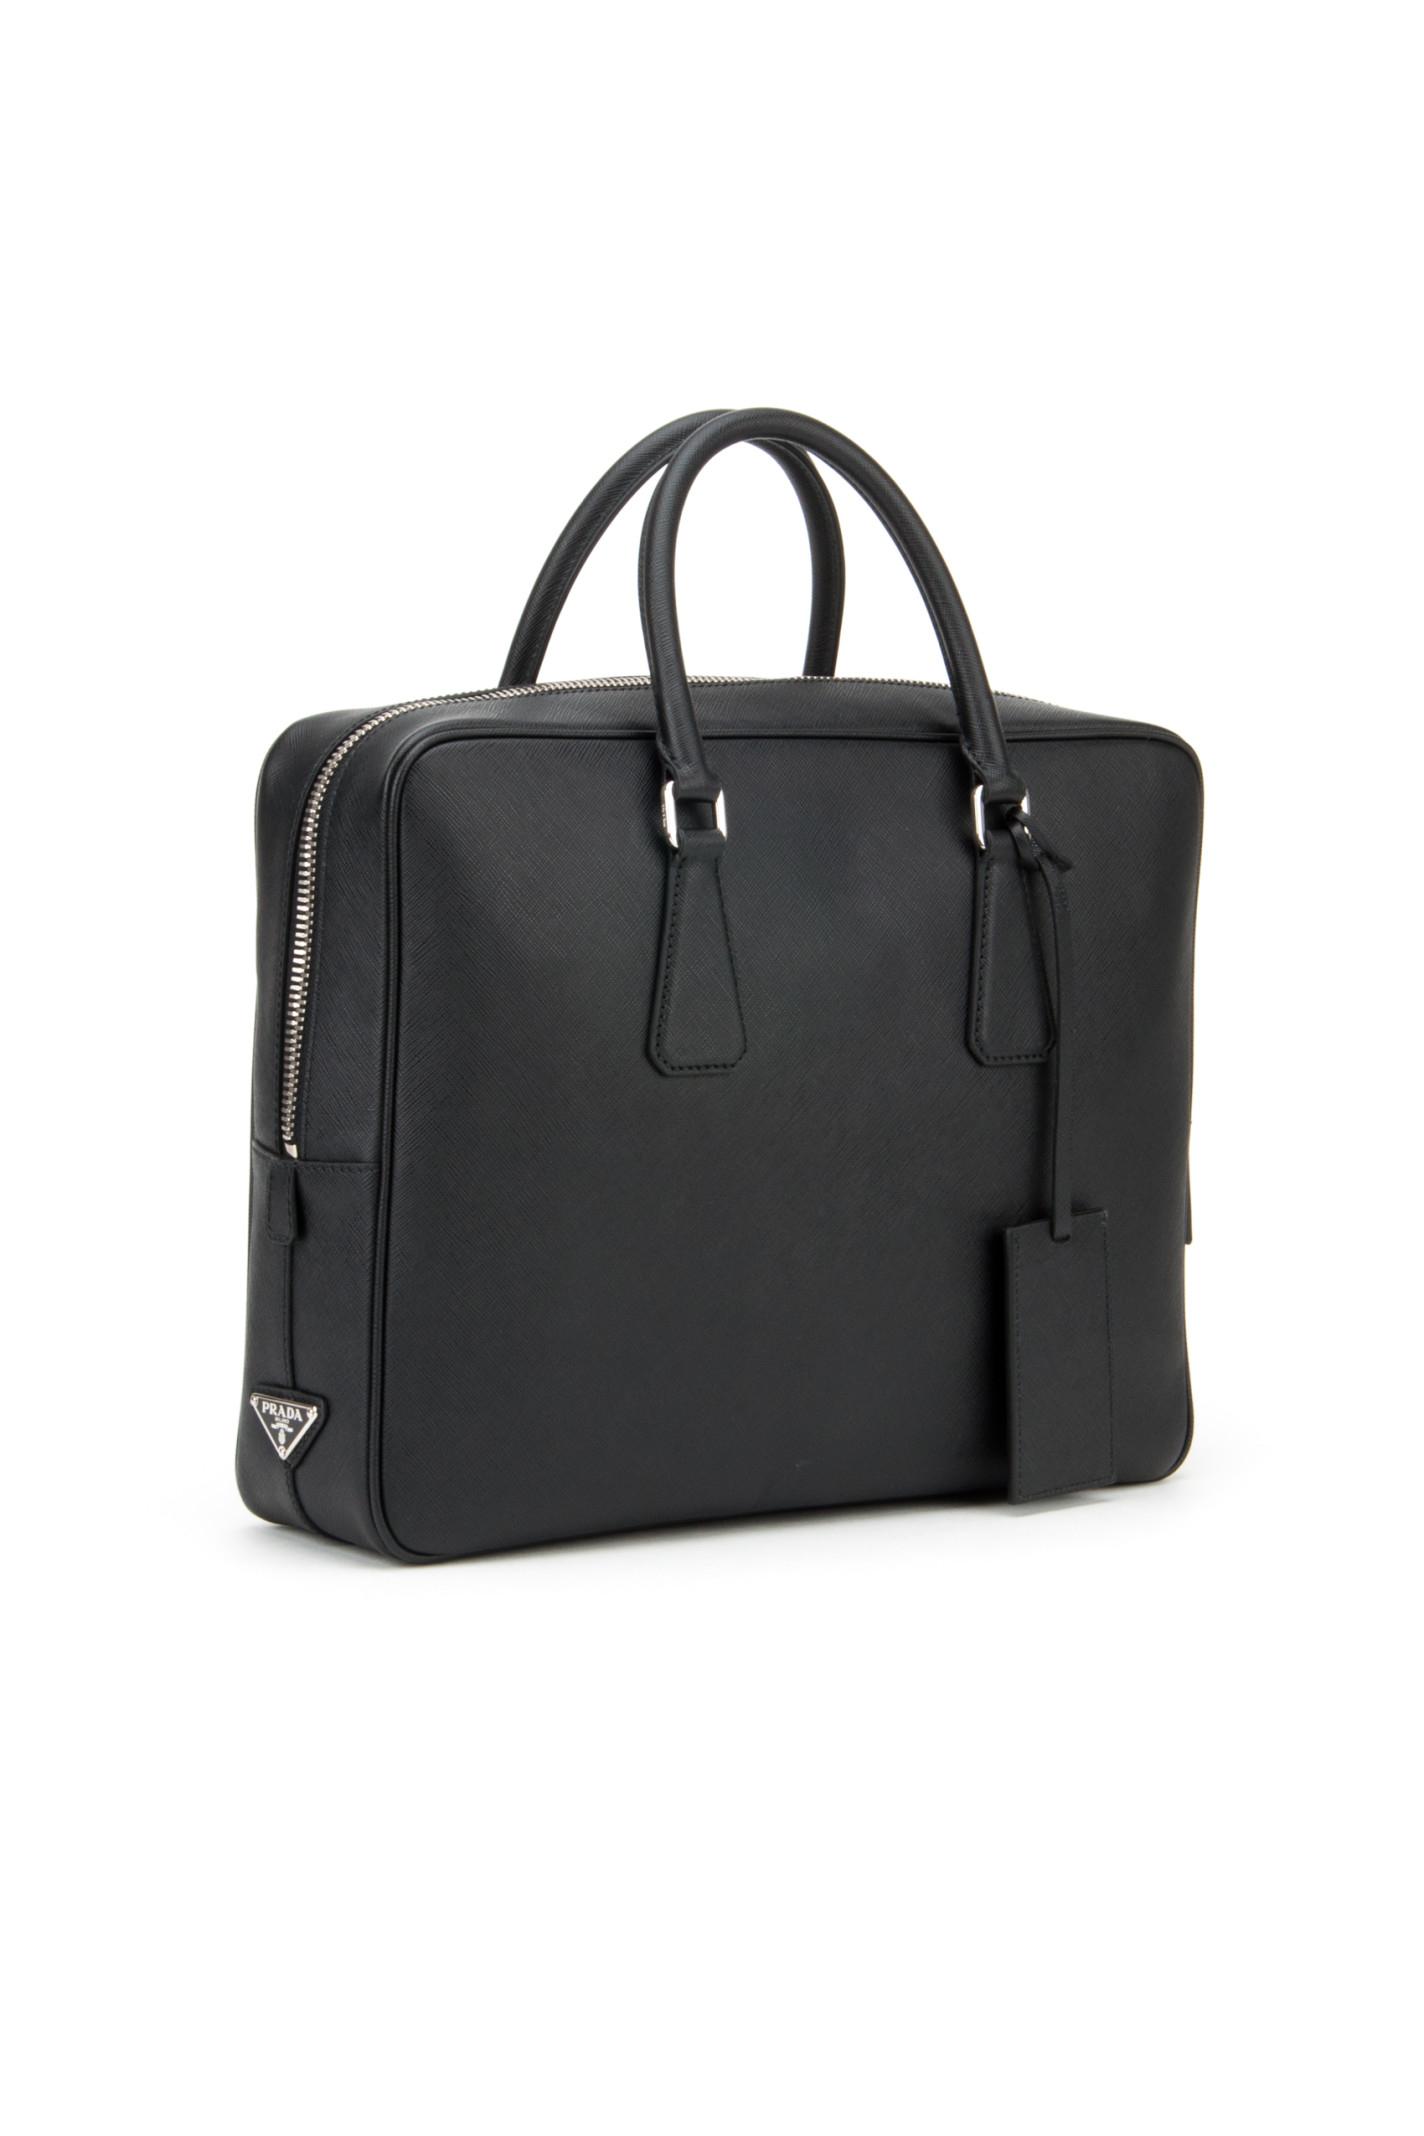 prada saffiano lux tote double zip - prada black cloth travel bag